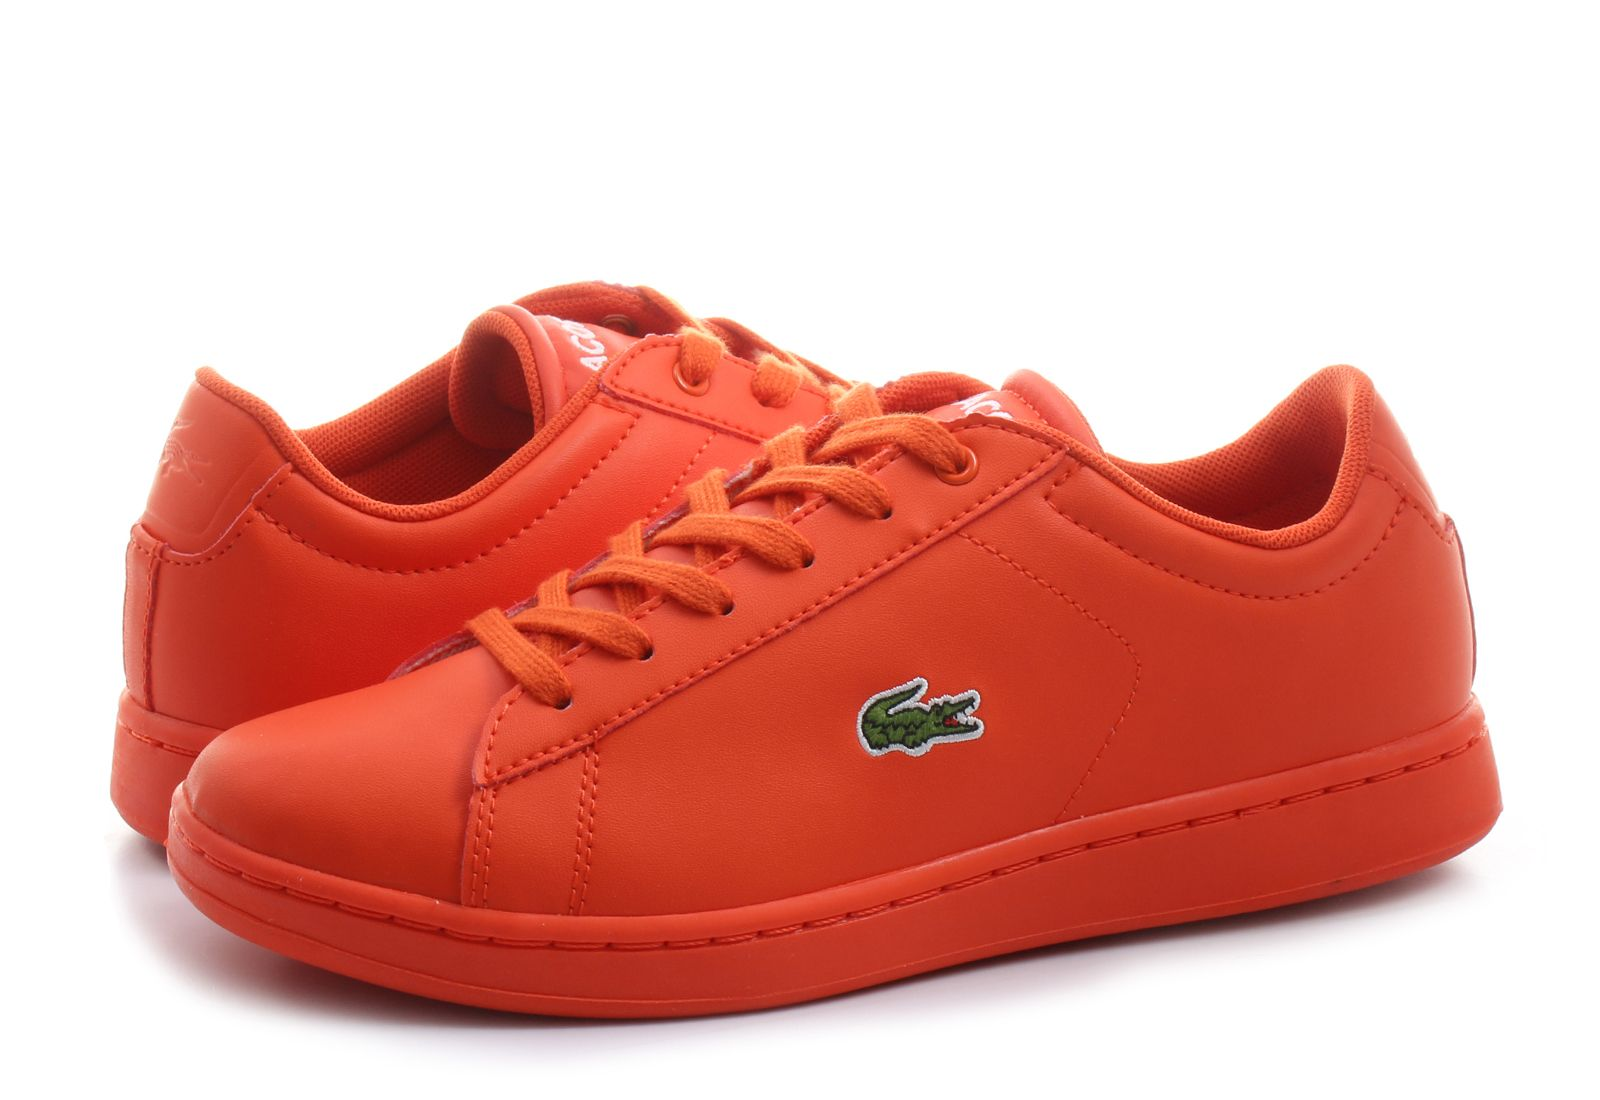 Lacoste Cipő - Carnaby Evo - 173SPJ0005-047 - Office Shoes ... 96e8d25ccb